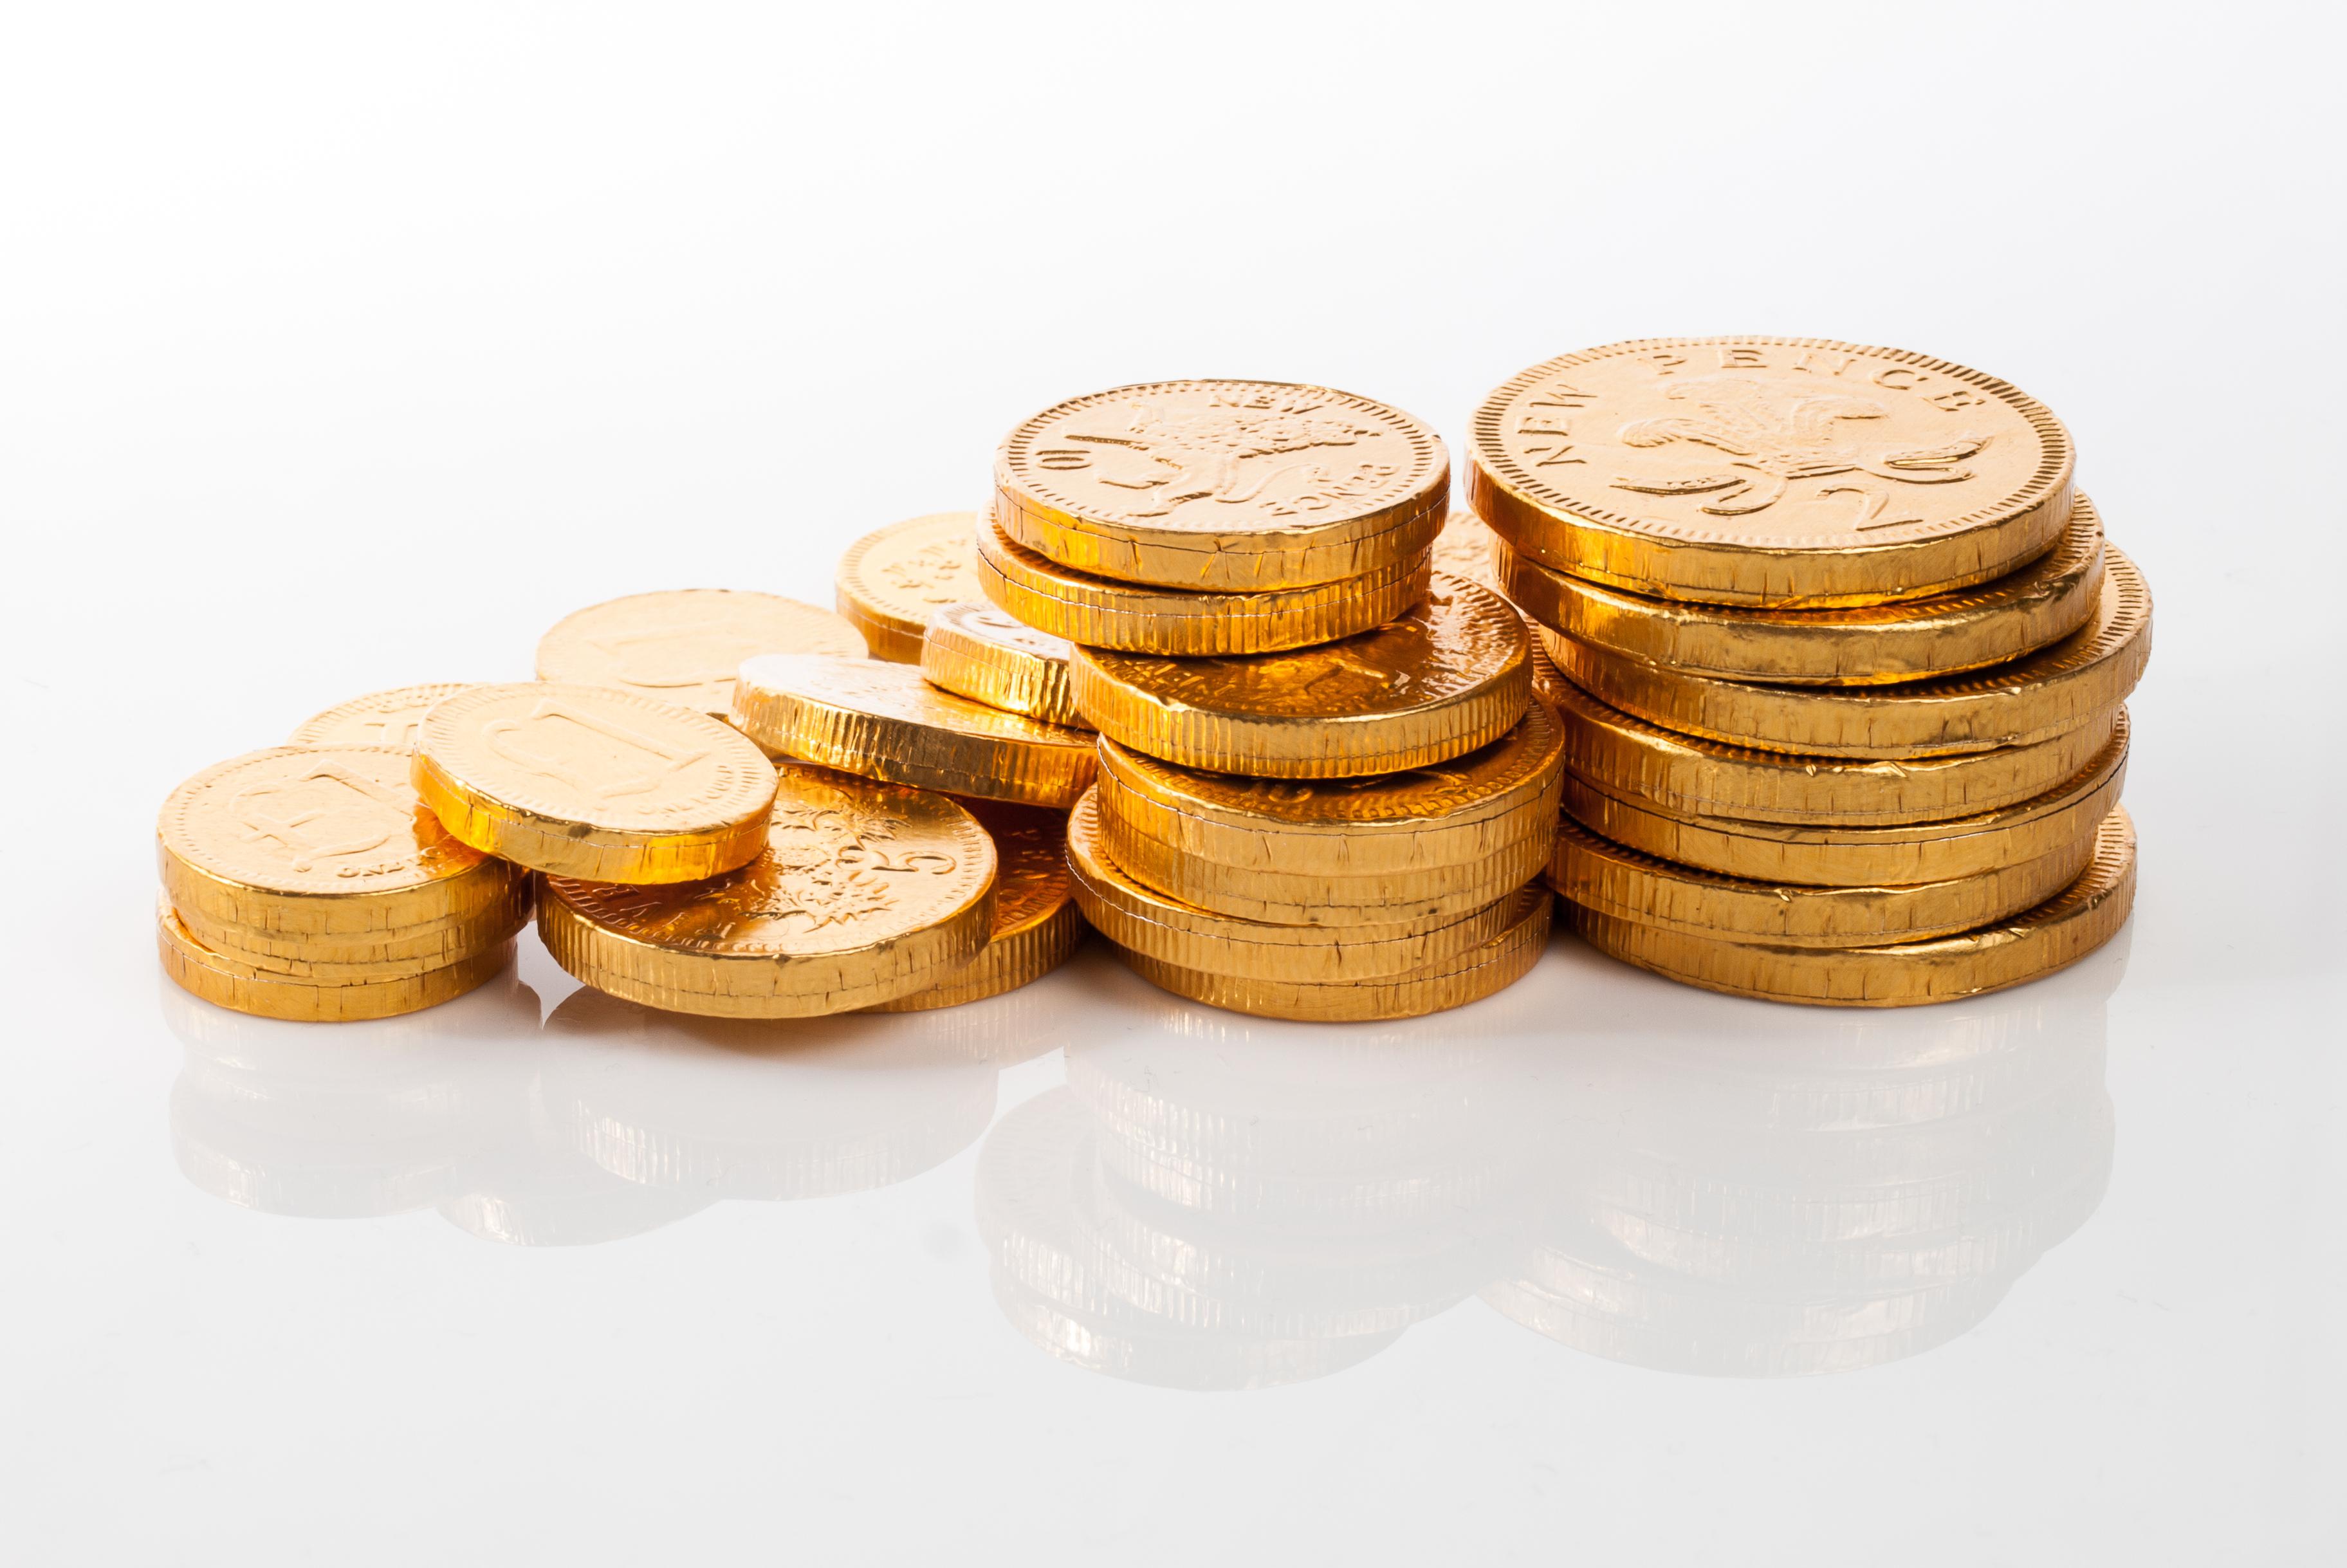 File:Chocolate Coins (11734181054).jpg - Wikimedia Commons